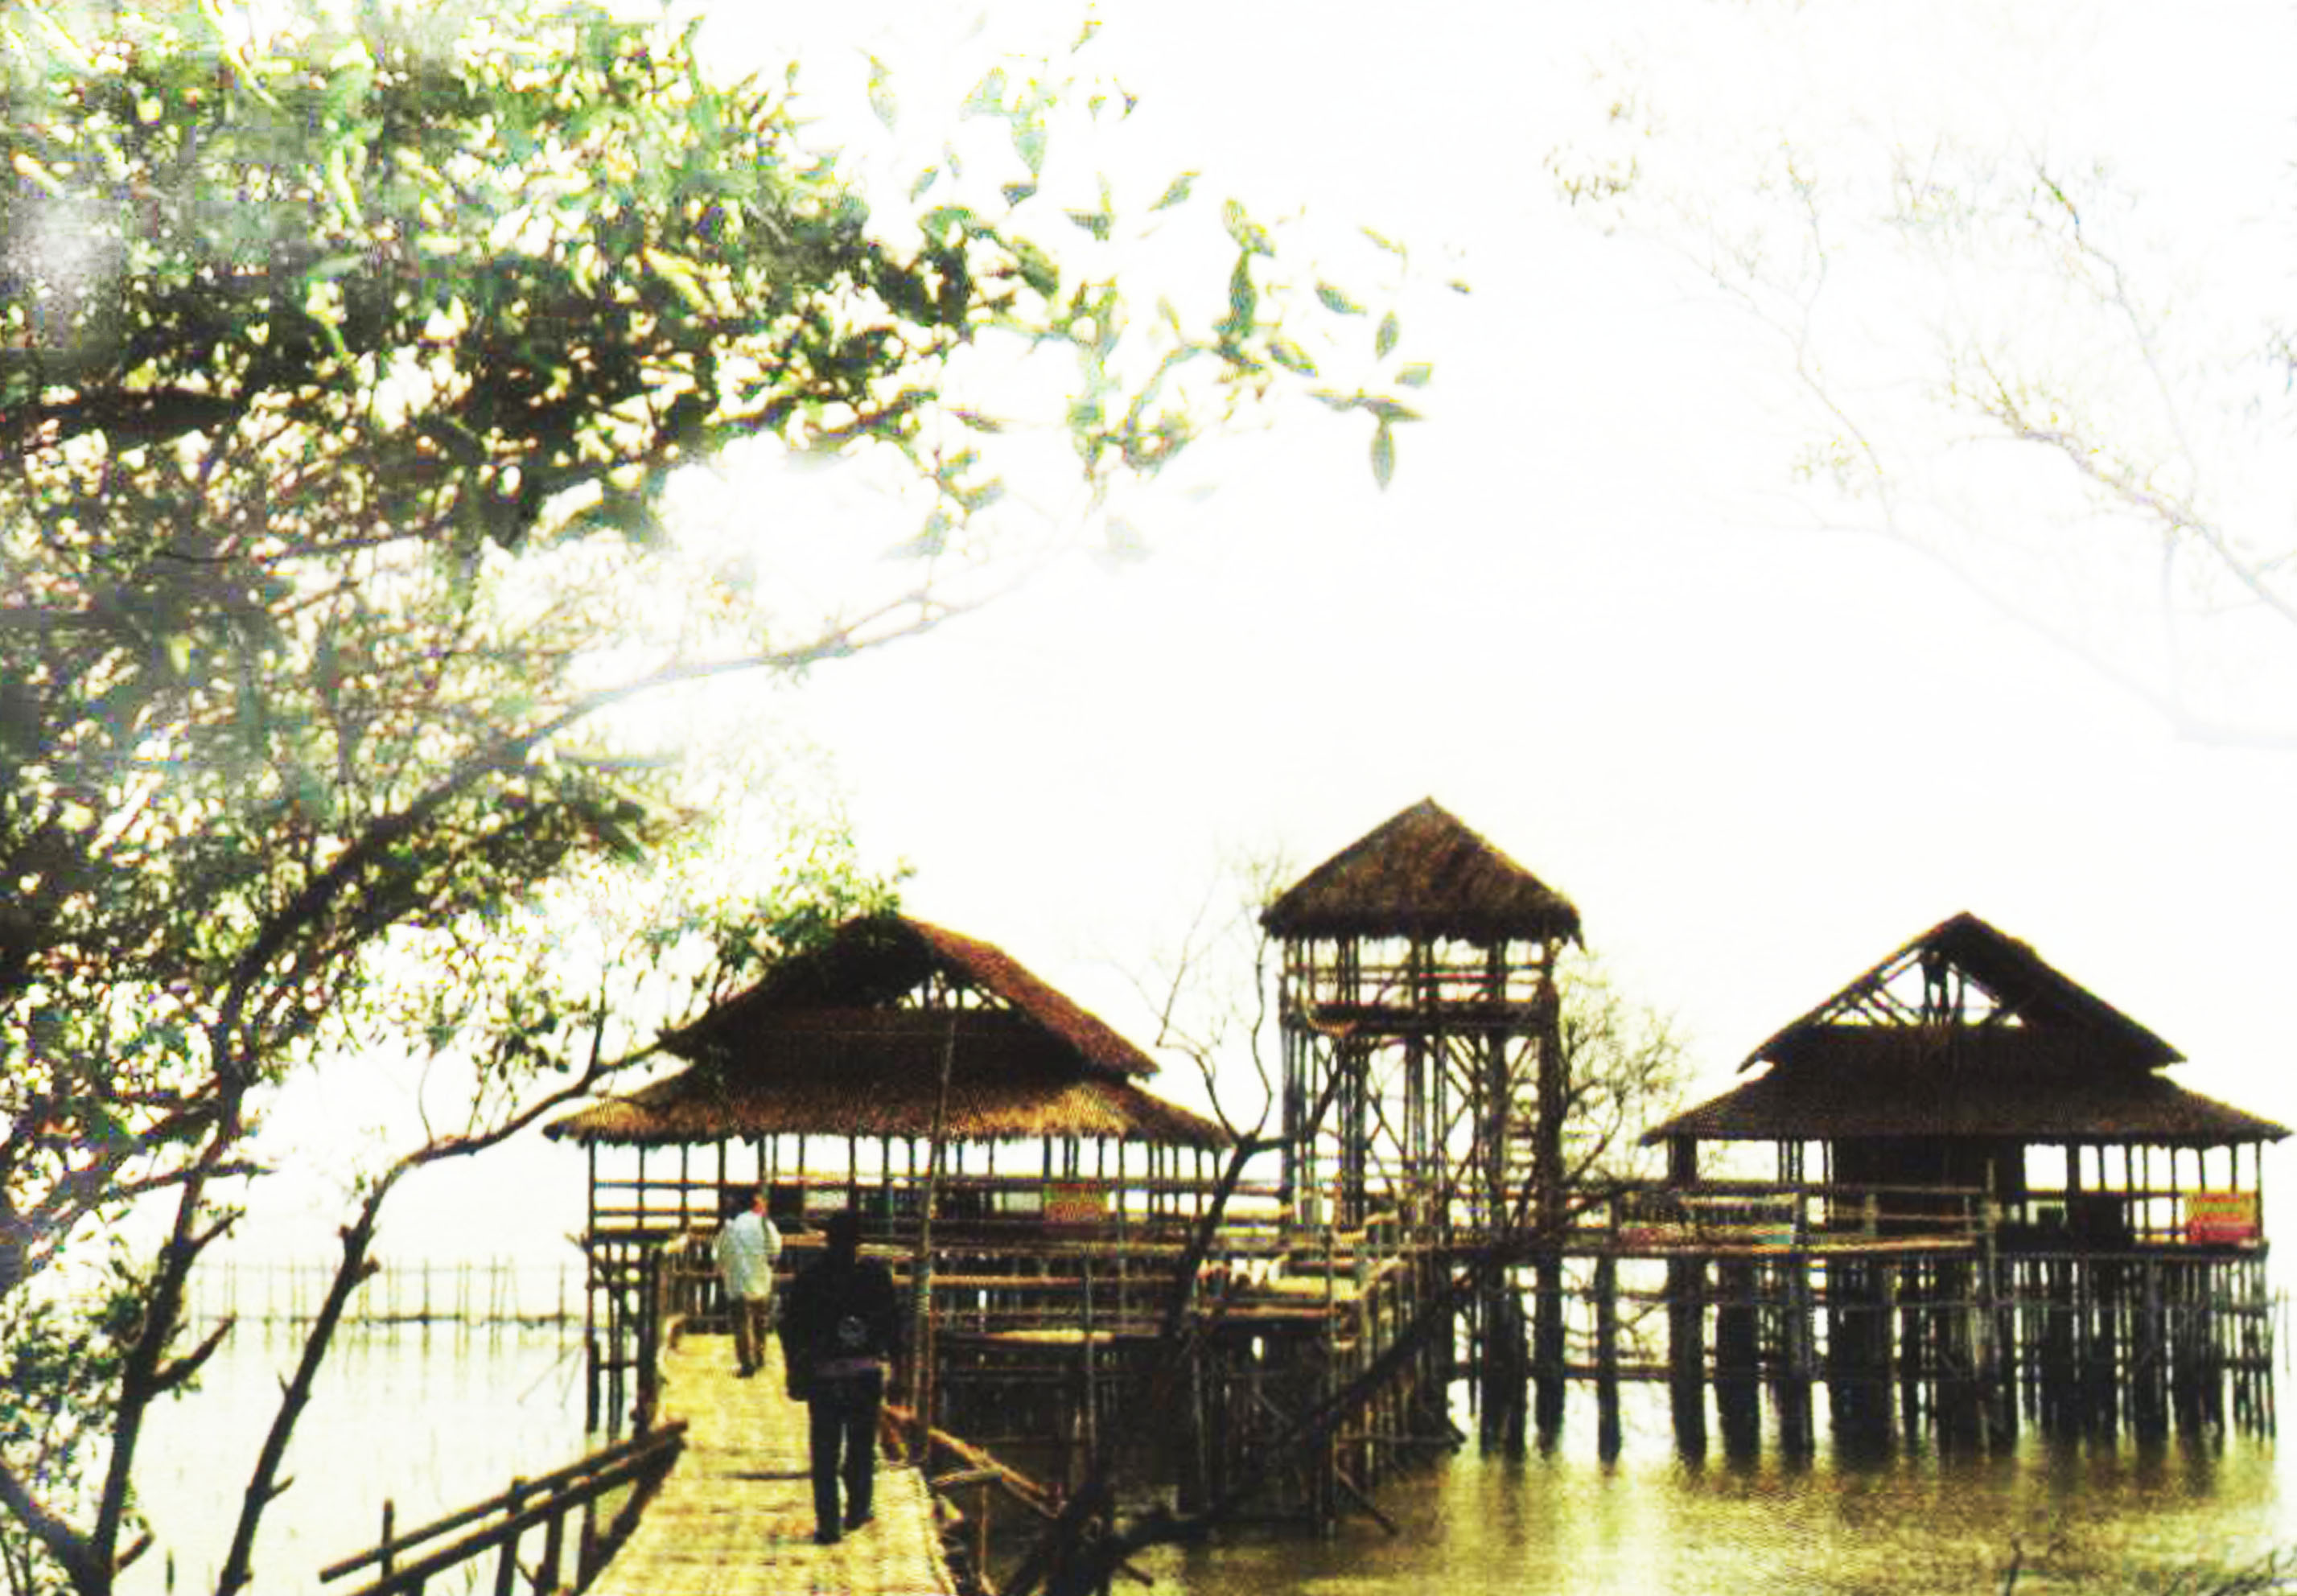 Ekowisata Mangrove Wonorejo Surabaya Wisata Jawatimuran 2 Hutan Kota